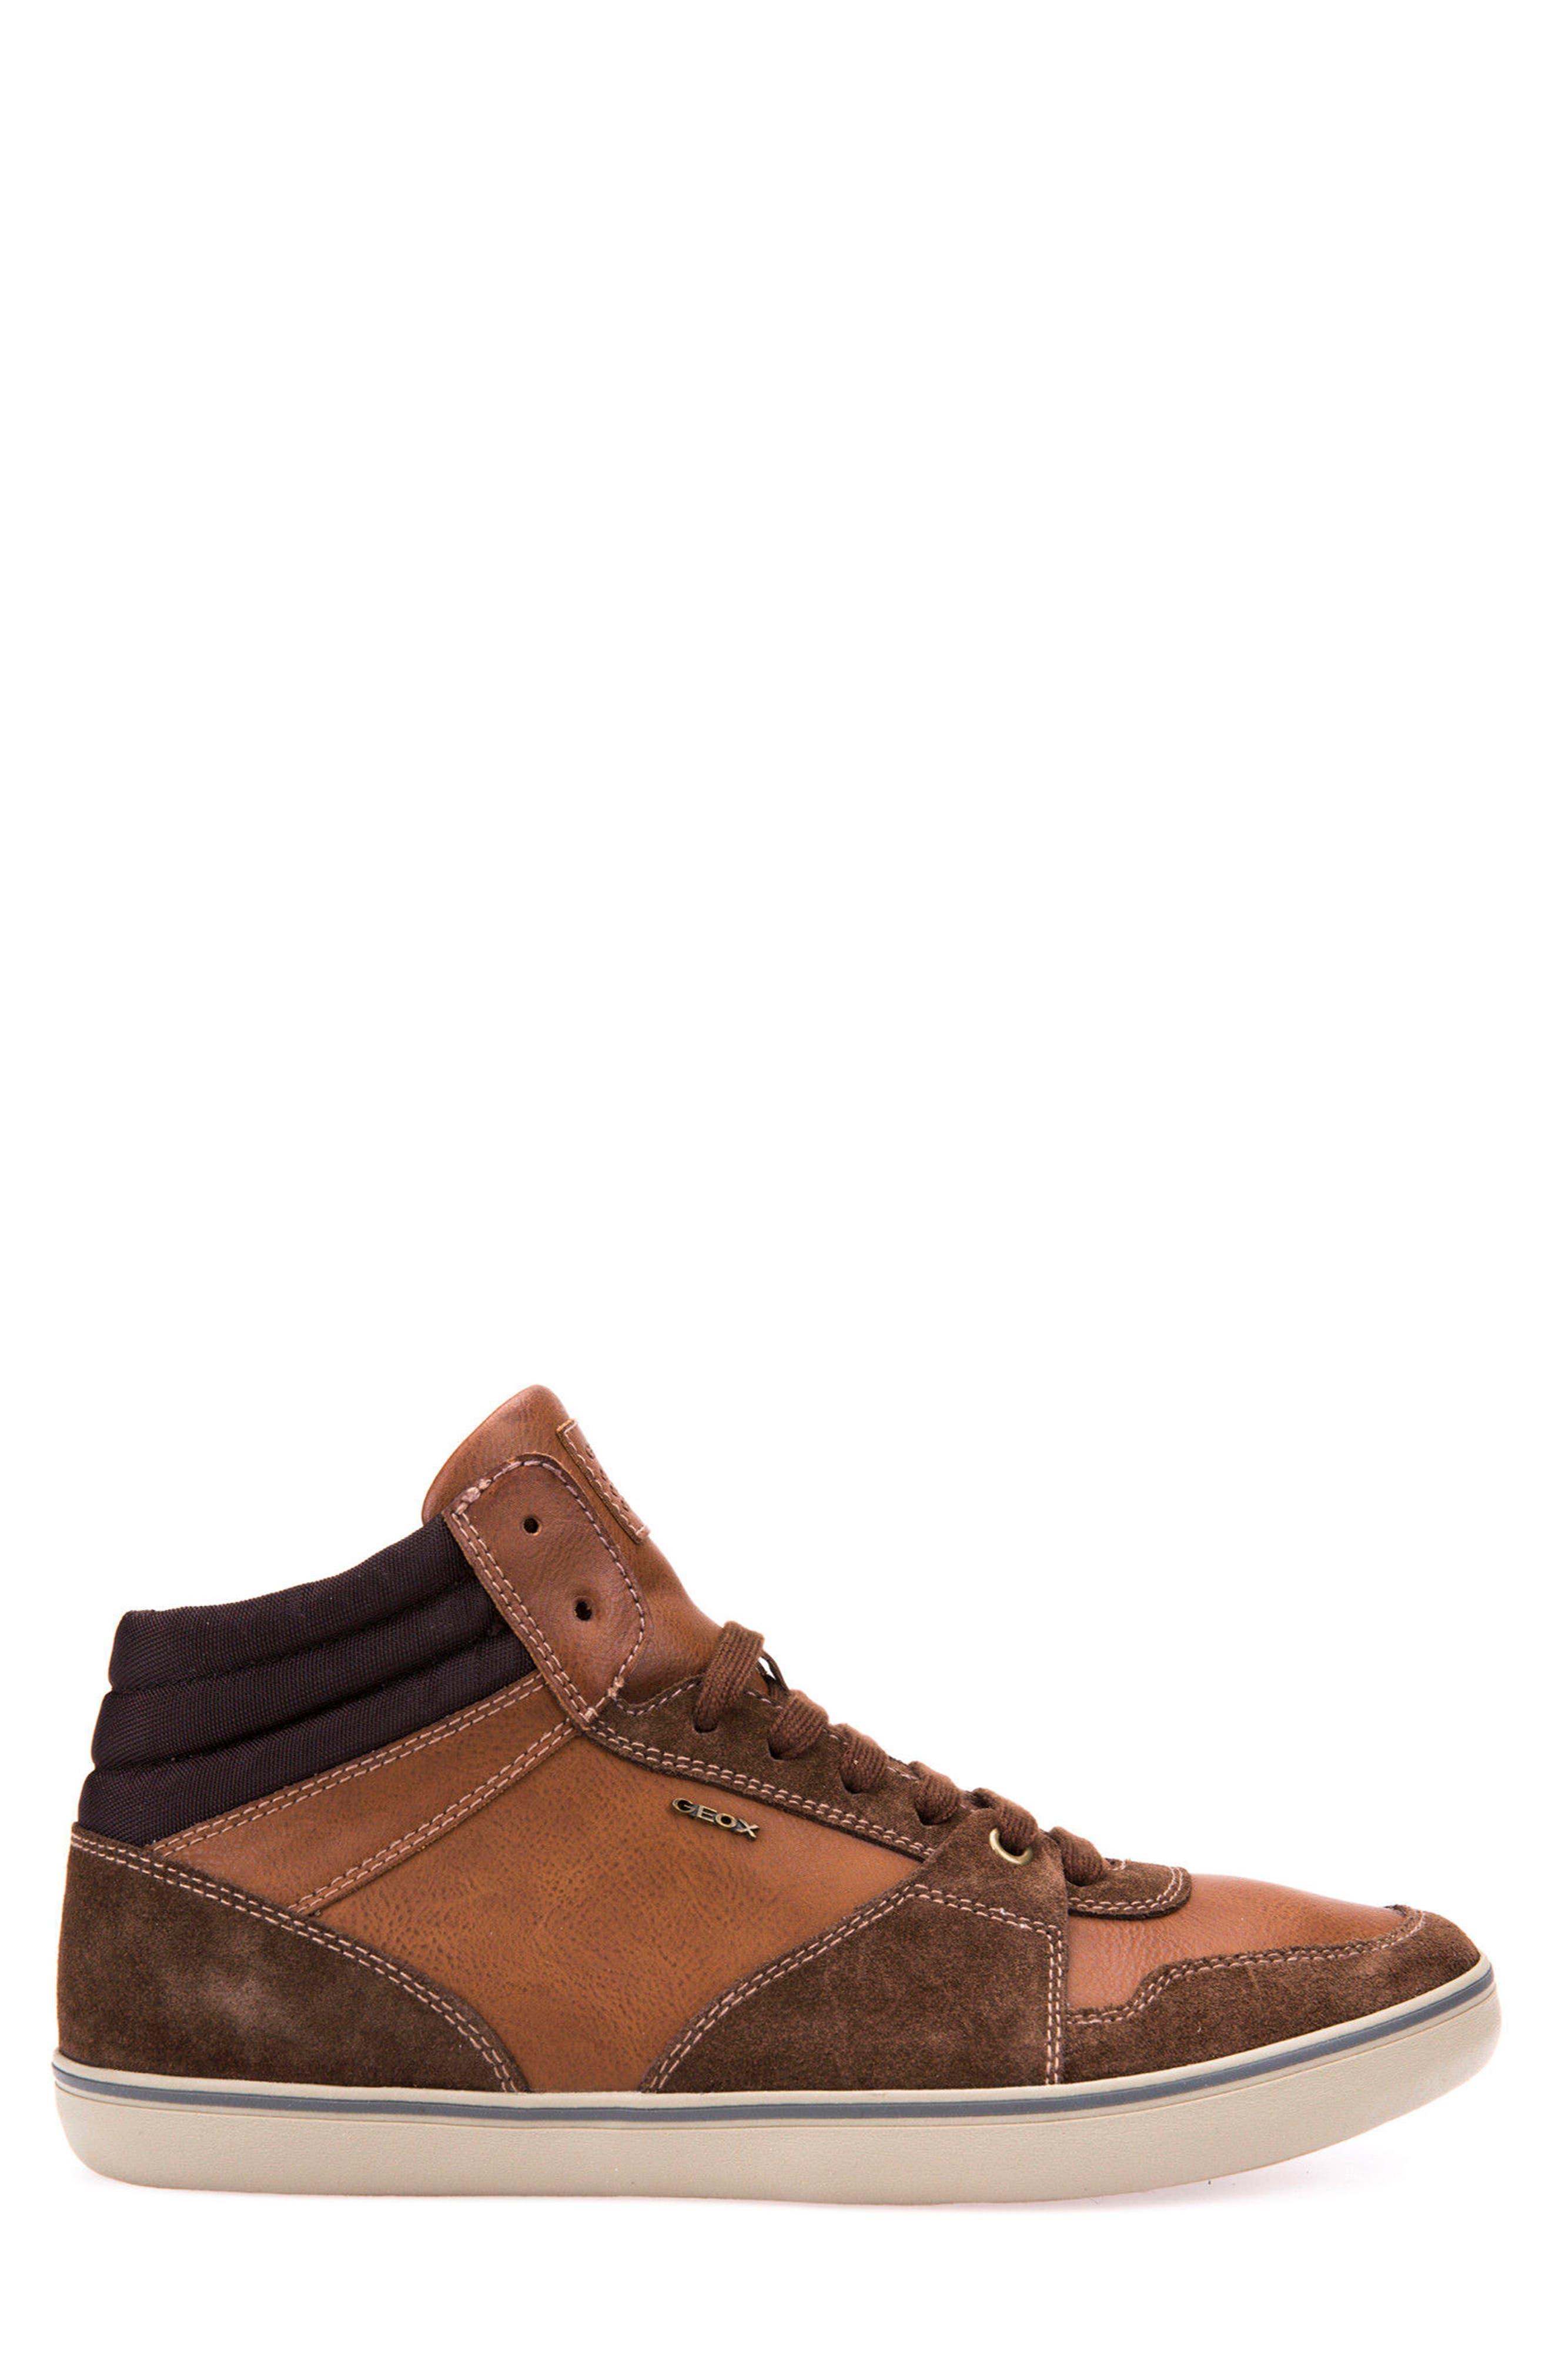 Box 30 High Top Sneaker,                             Alternate thumbnail 3, color,